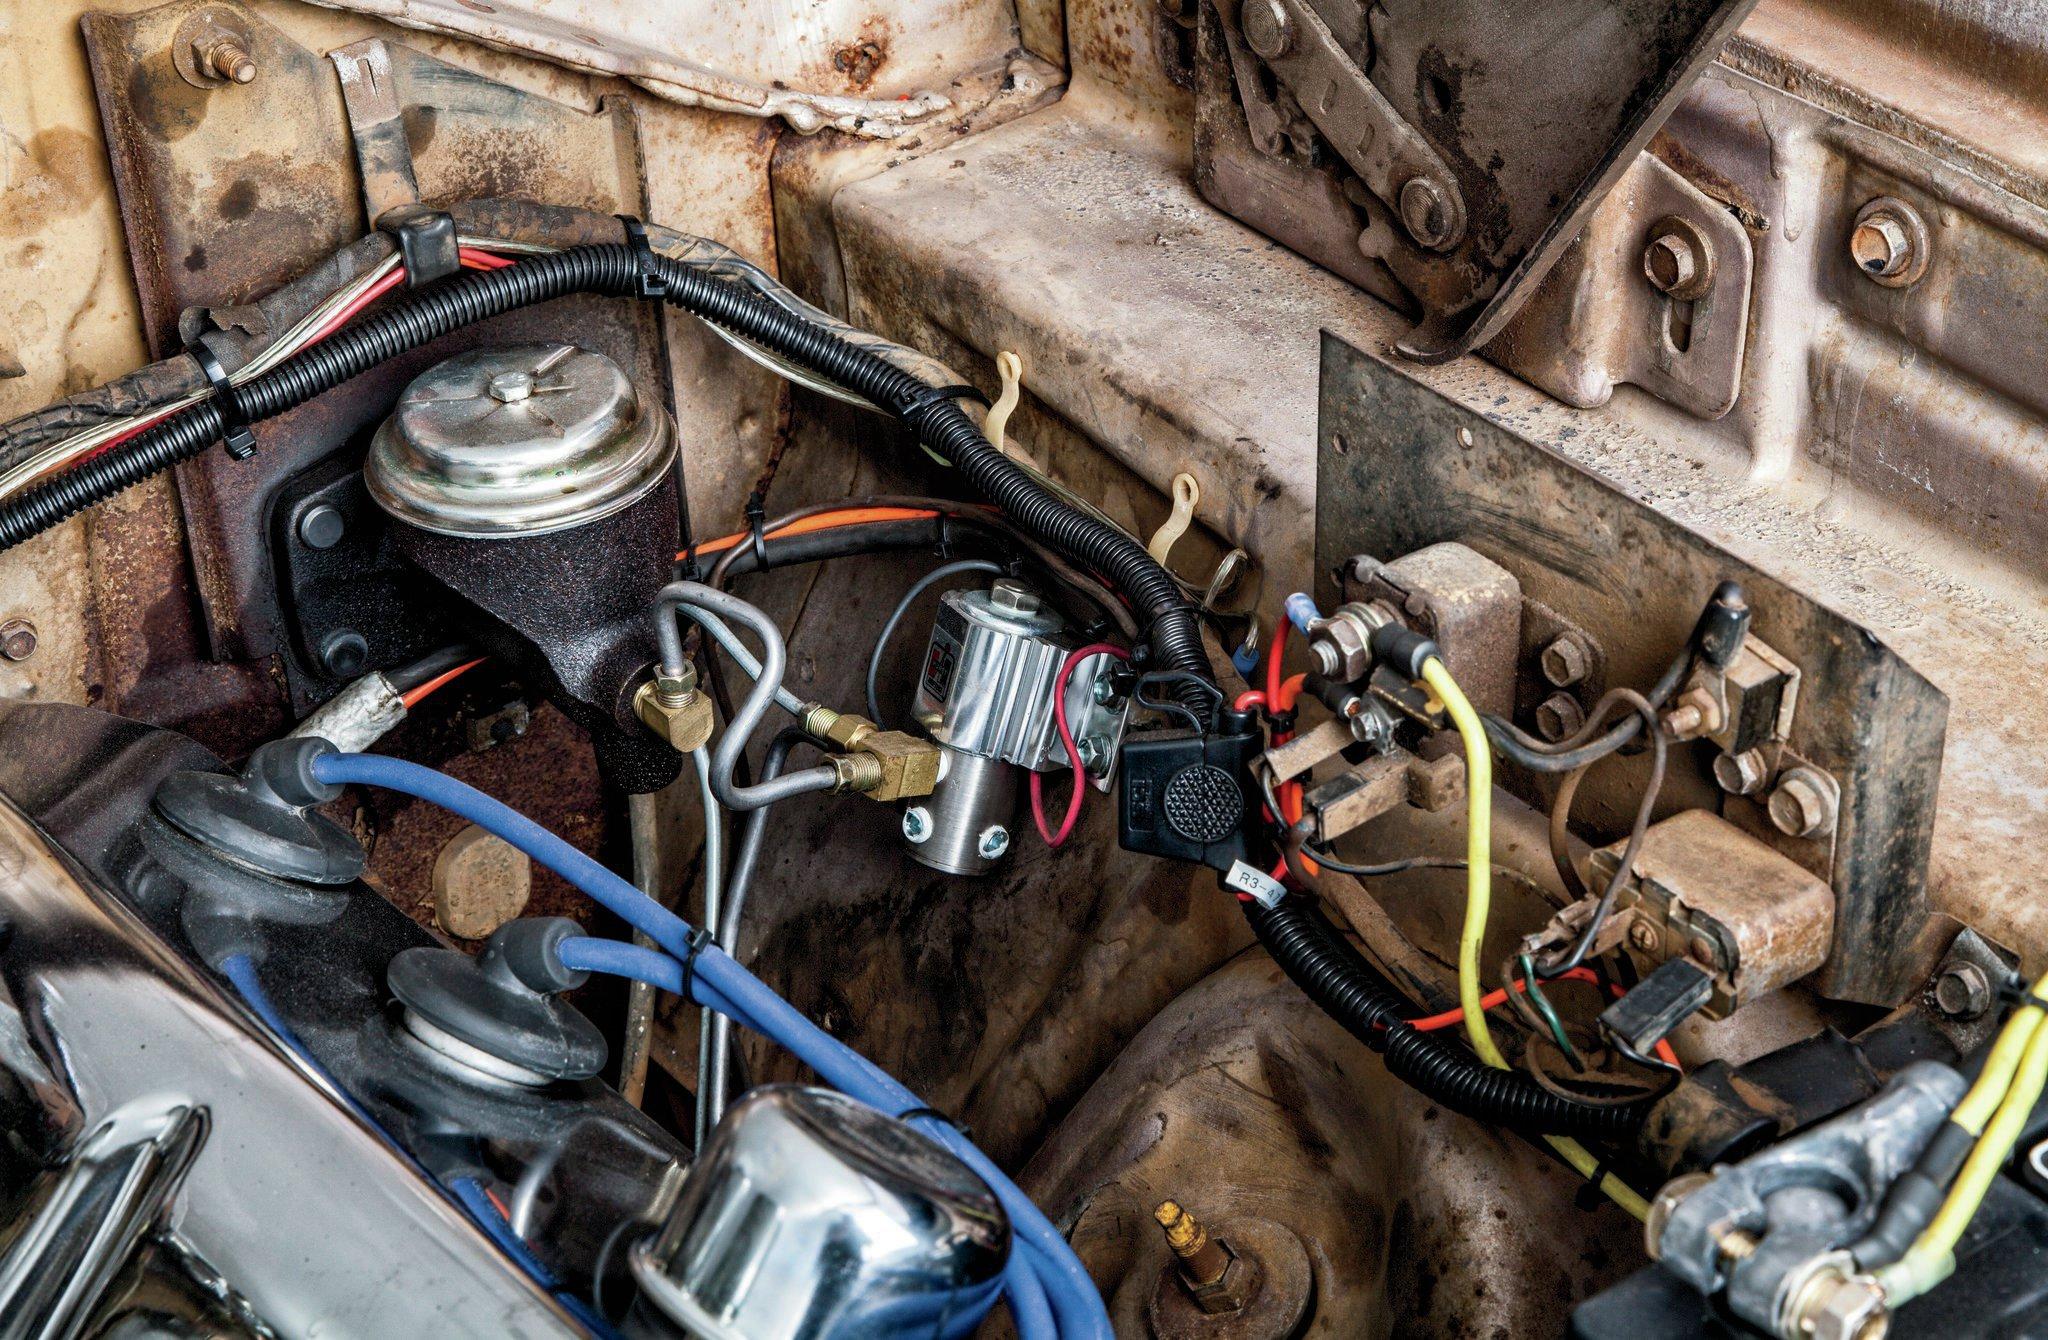 hight resolution of 1966 dodge coronet unrestored 426ci hemi engine wiring on firewall rh hotrod com